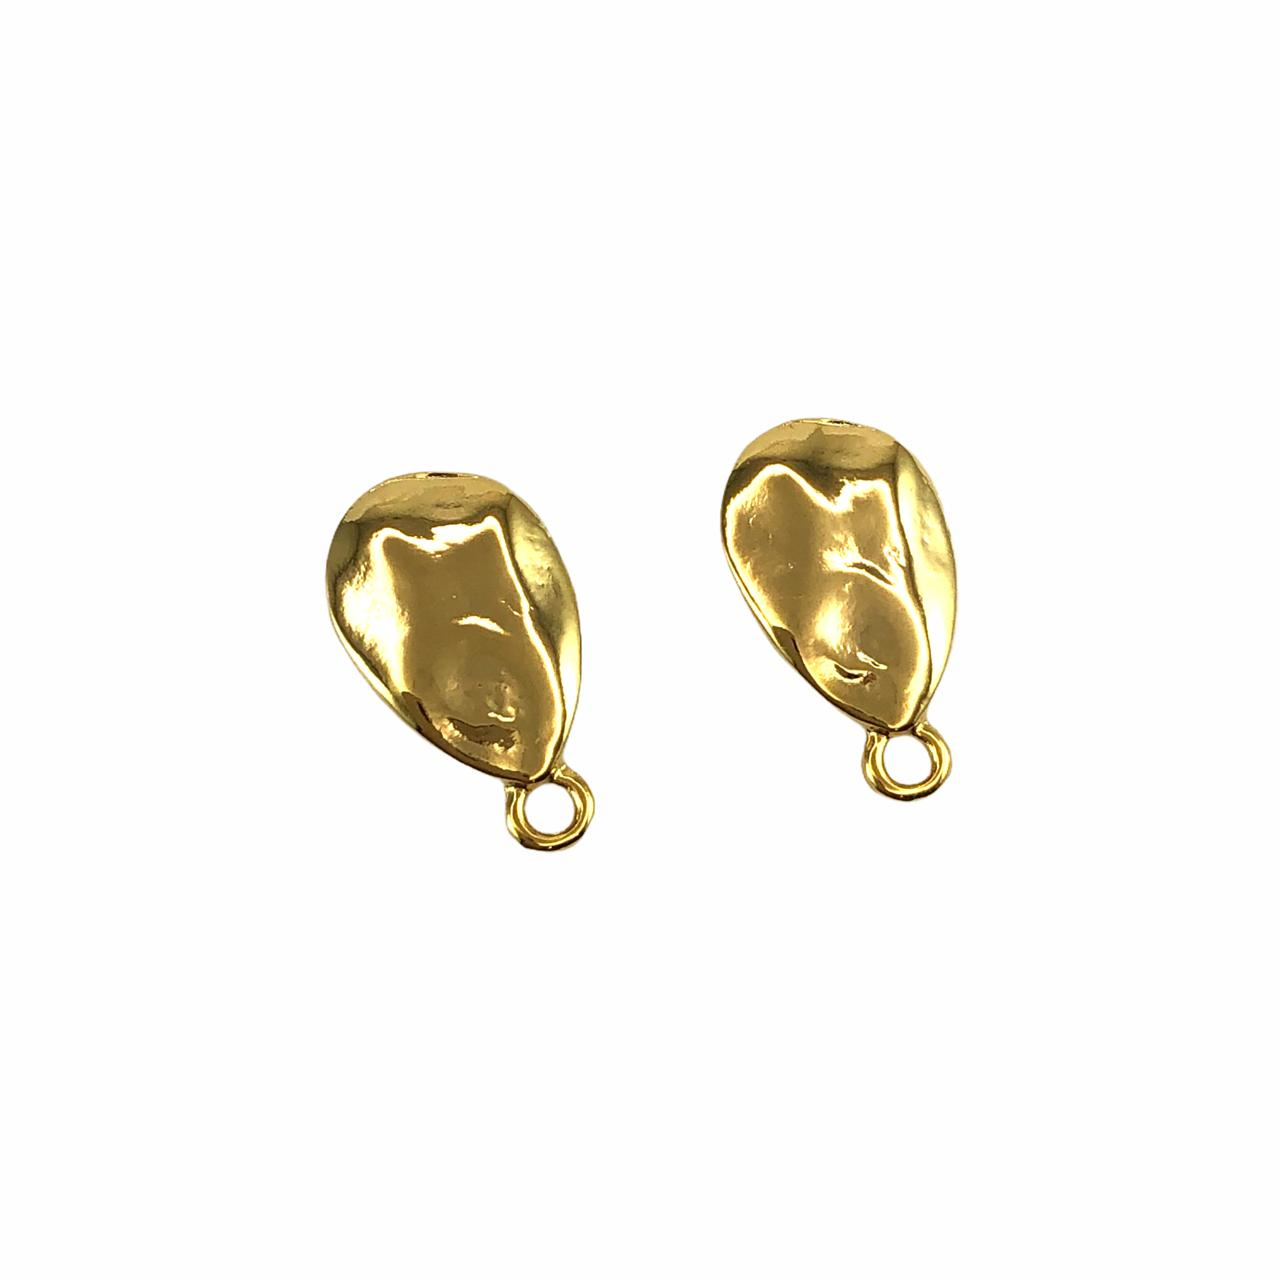 BP1682 - Base de Brinco Gota Banhado Cor Dourado - 01Par